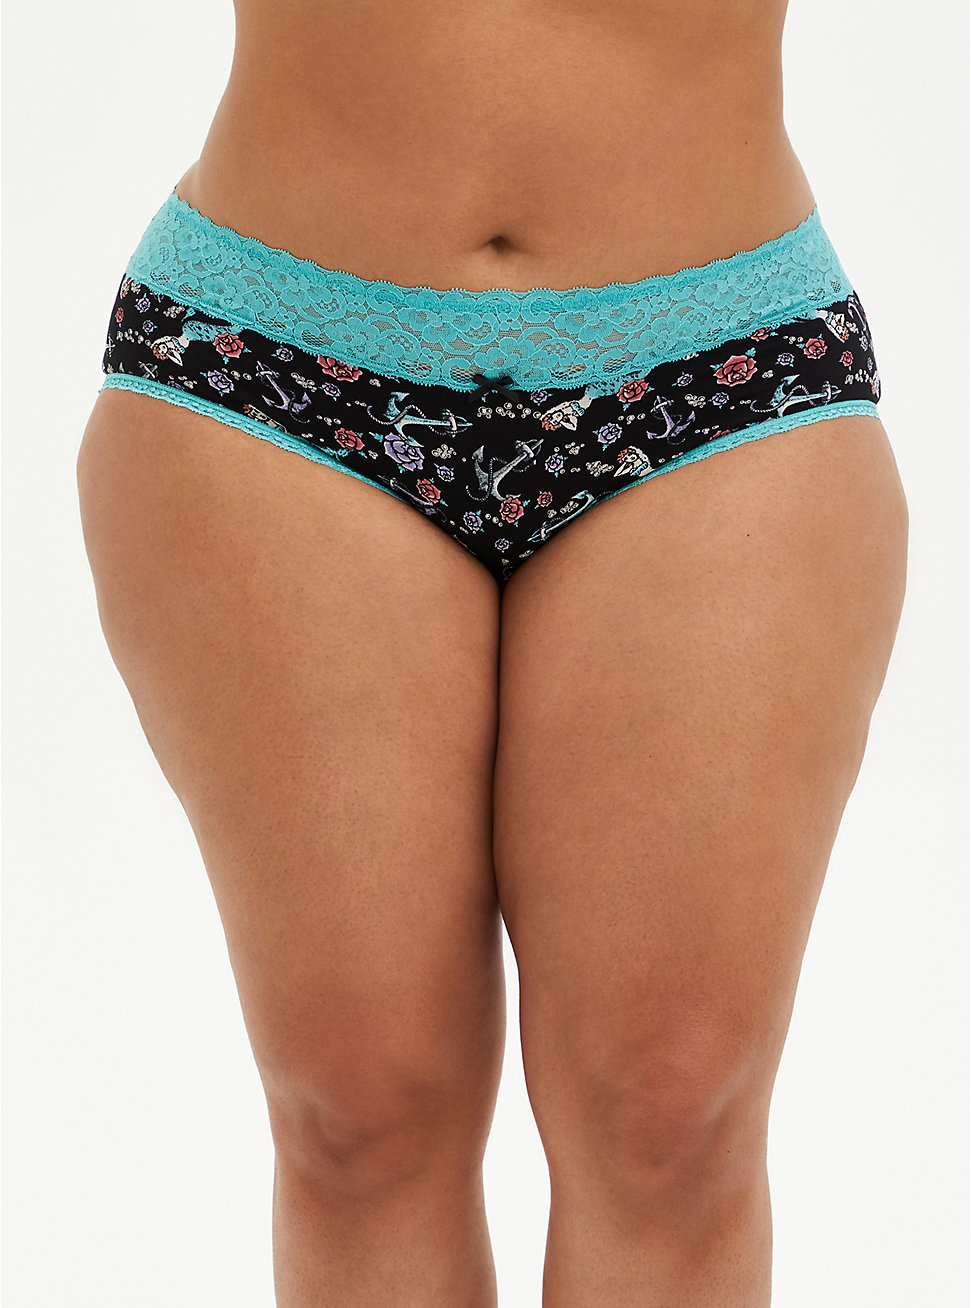 Mermaid Wide Lace Cotton Cheeky Panty, VINTAGE NAUTICAL- BLACK, hi-res